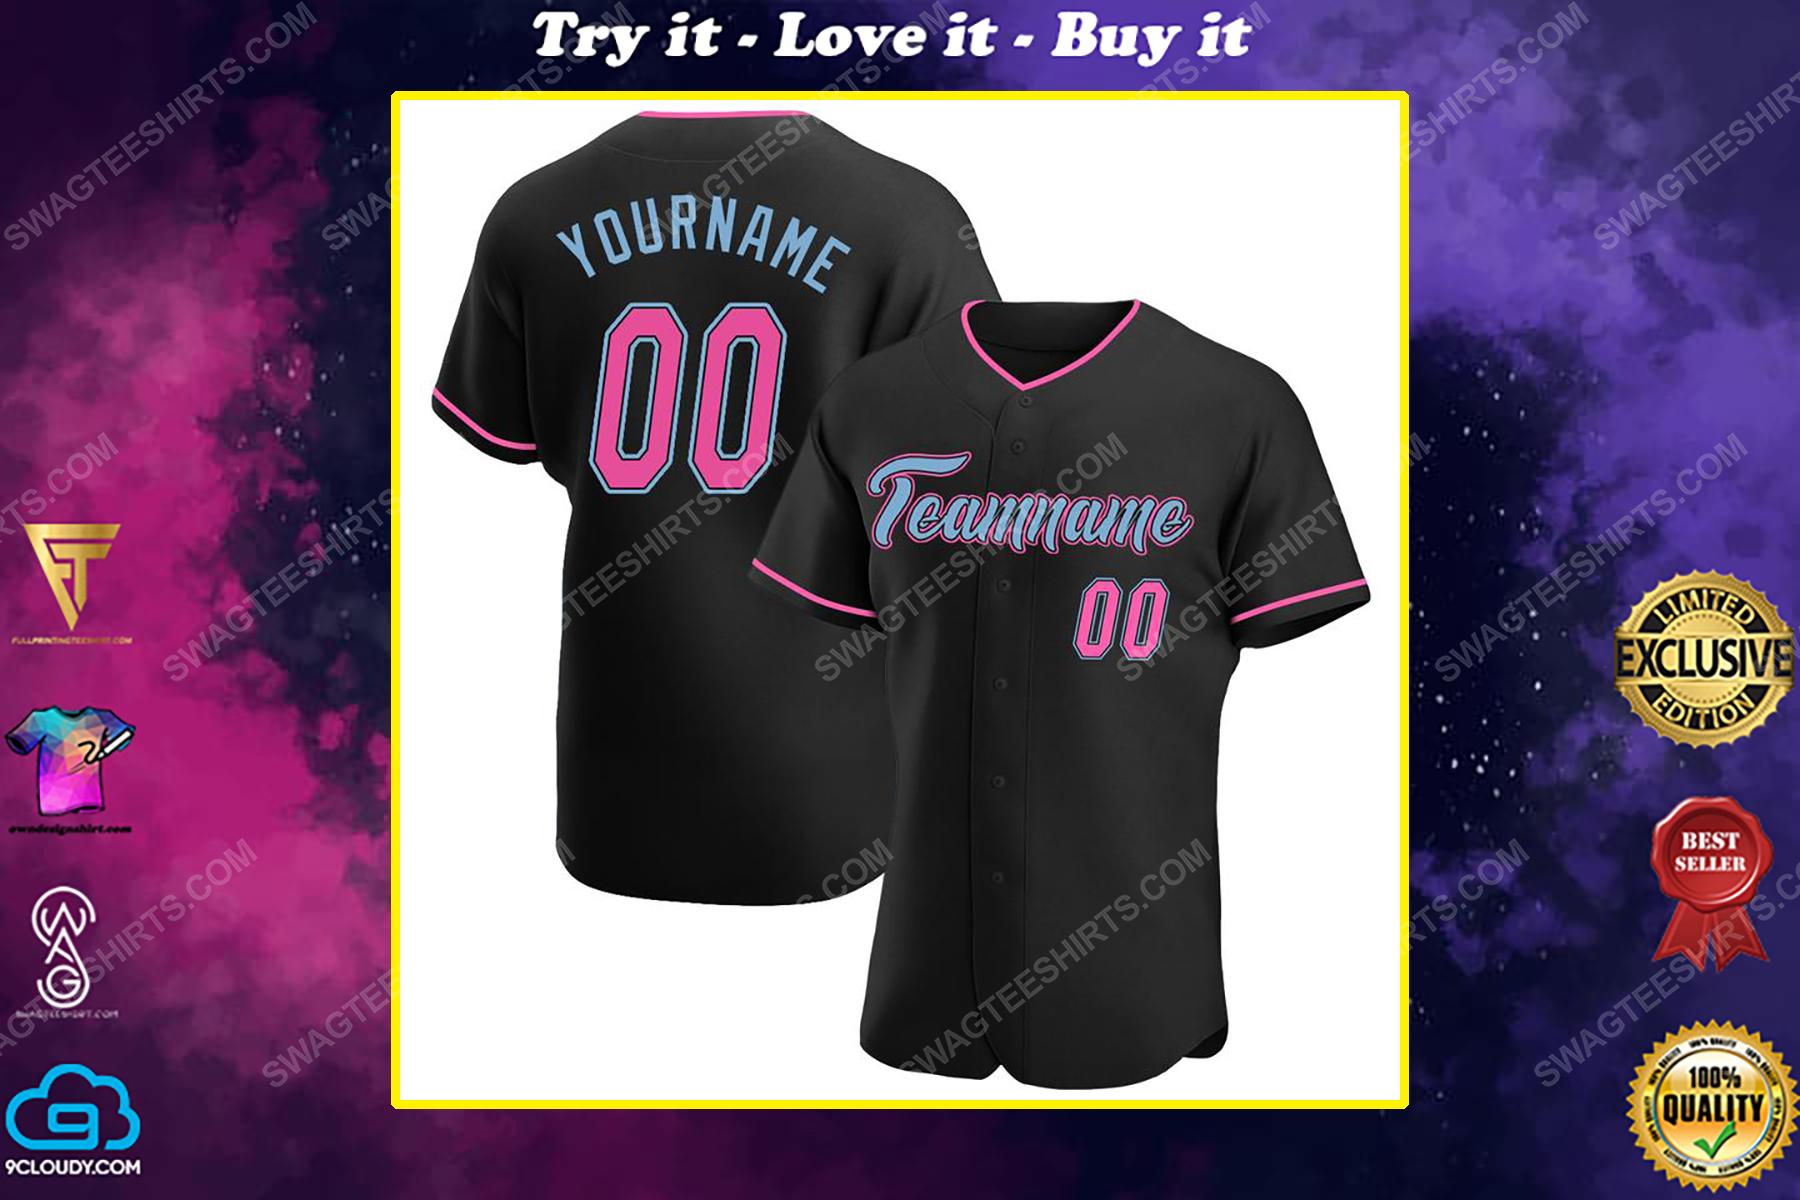 Custom team name oakland athletics full printed baseball jersey